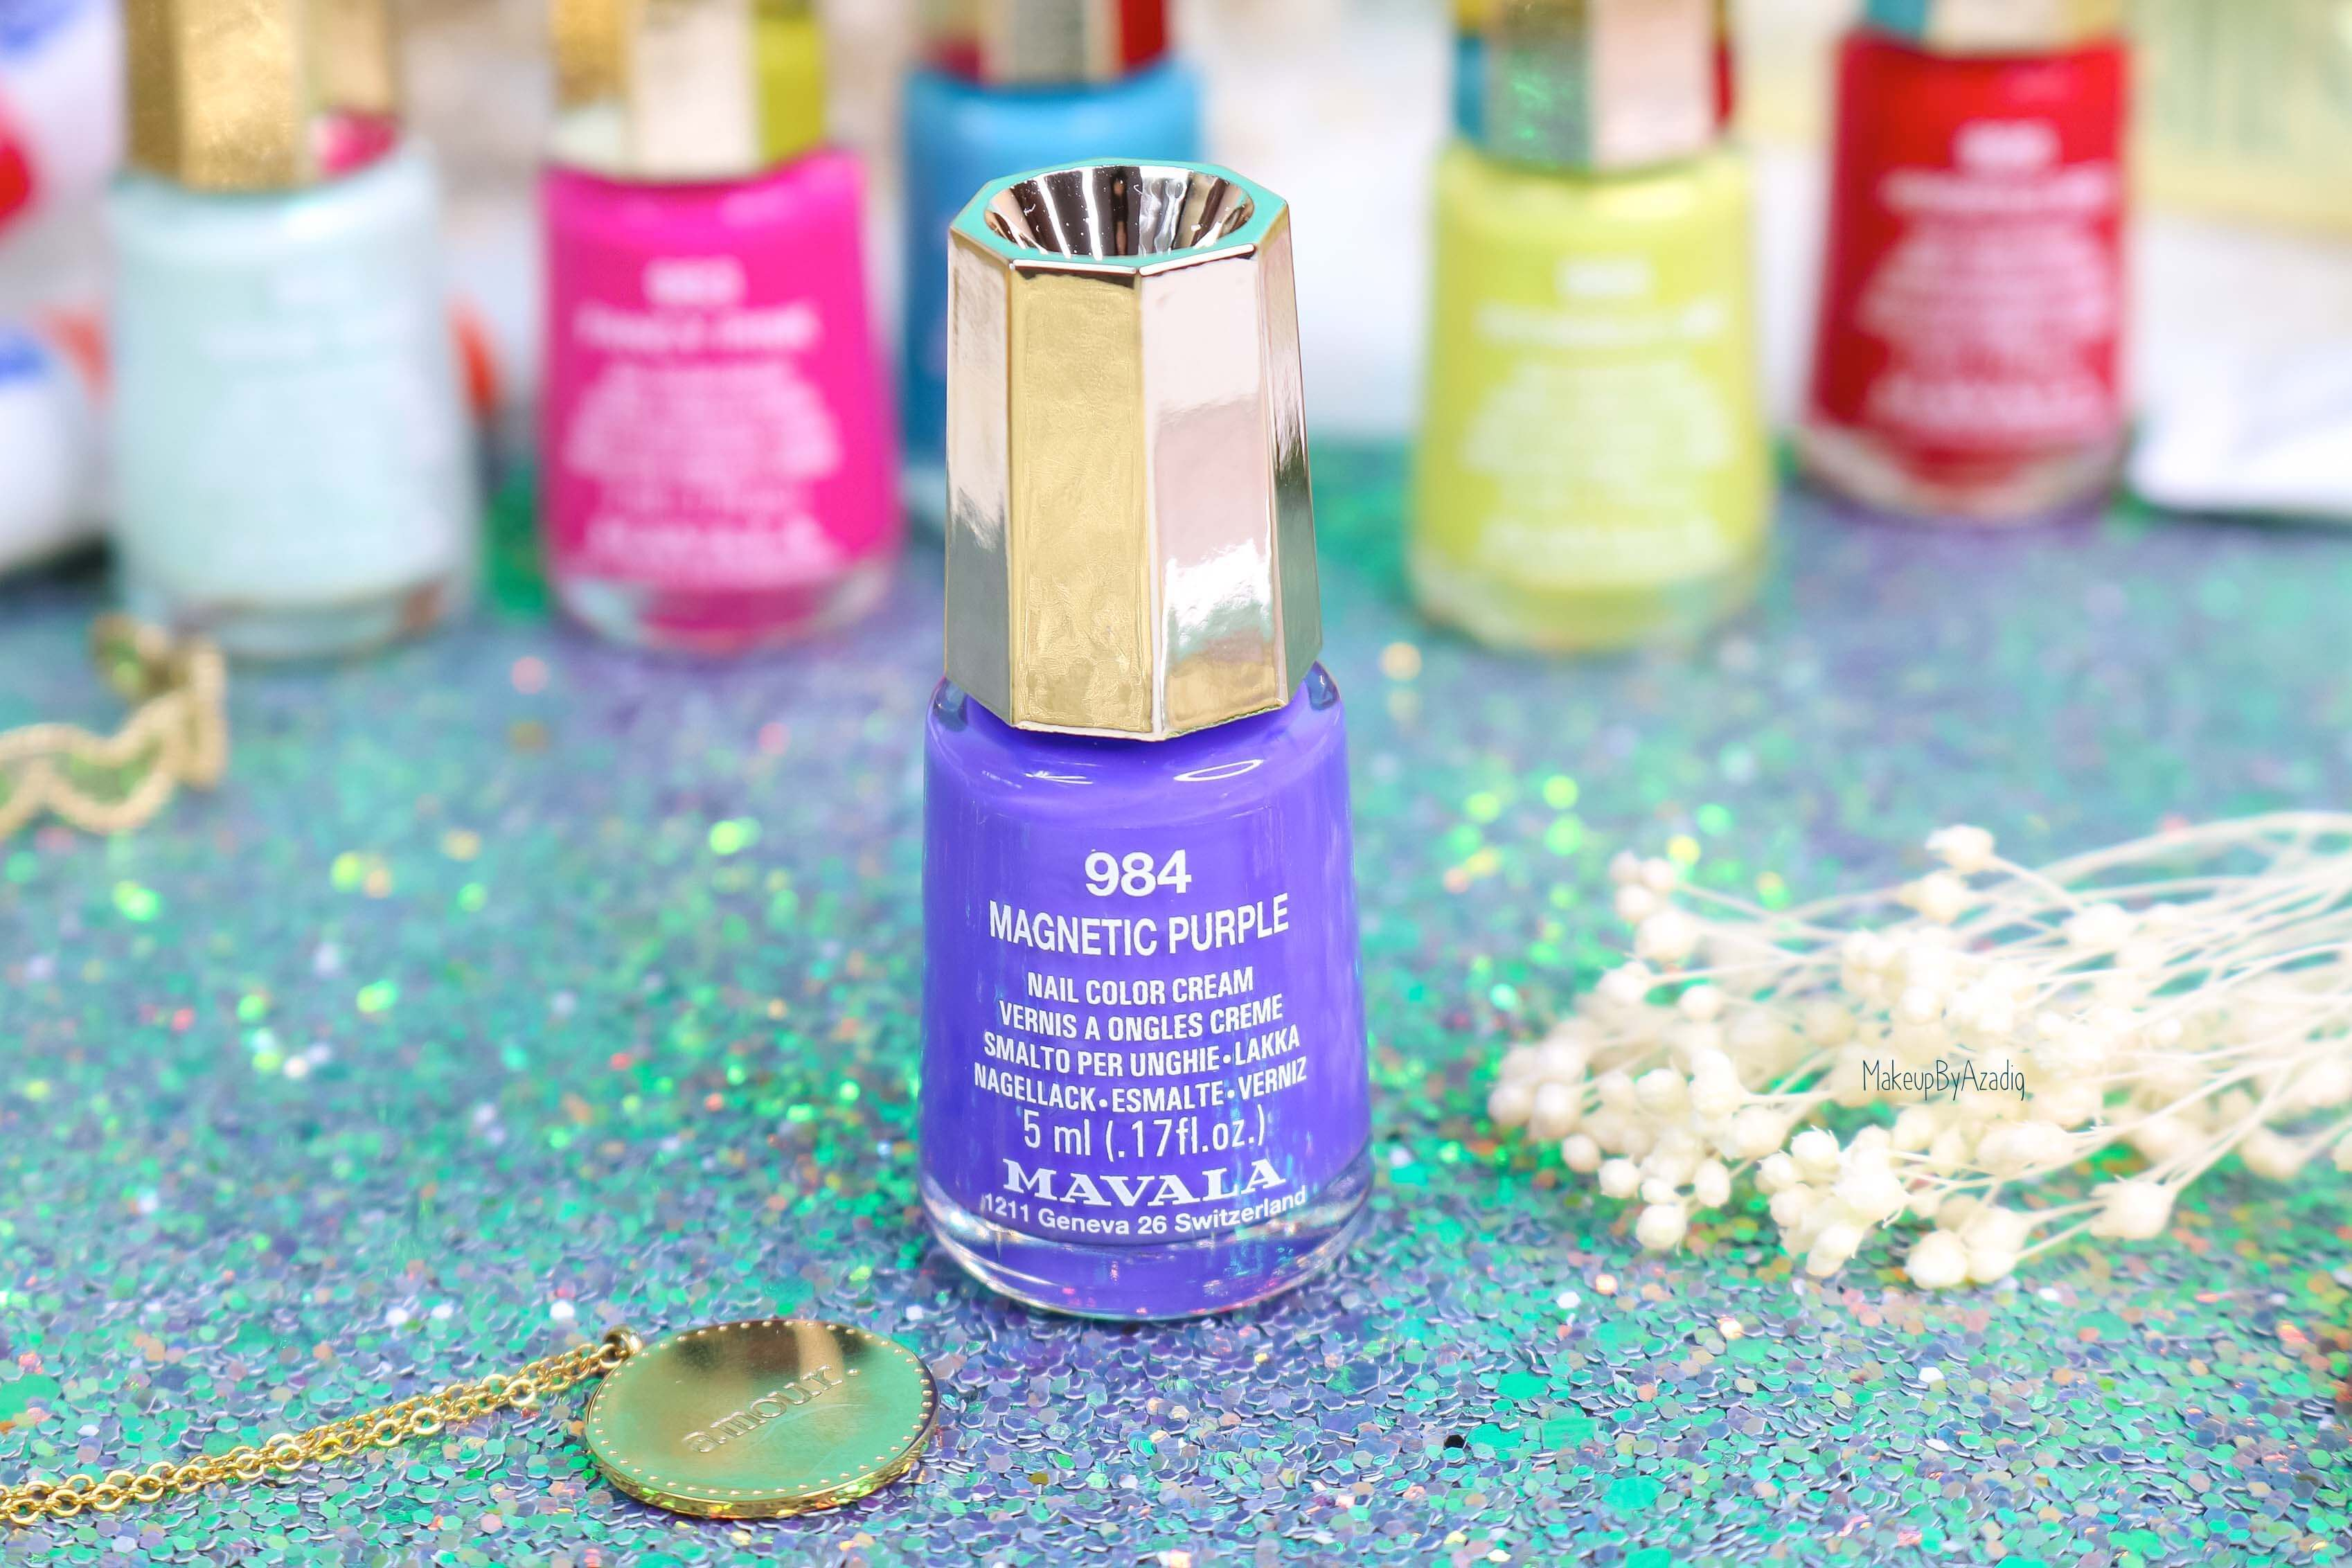 revue-collection-vernis-mavala-nails-dash-splash-ete-2019-bleu-orange-makeupbyazadig-swatch-avis-prix-purple